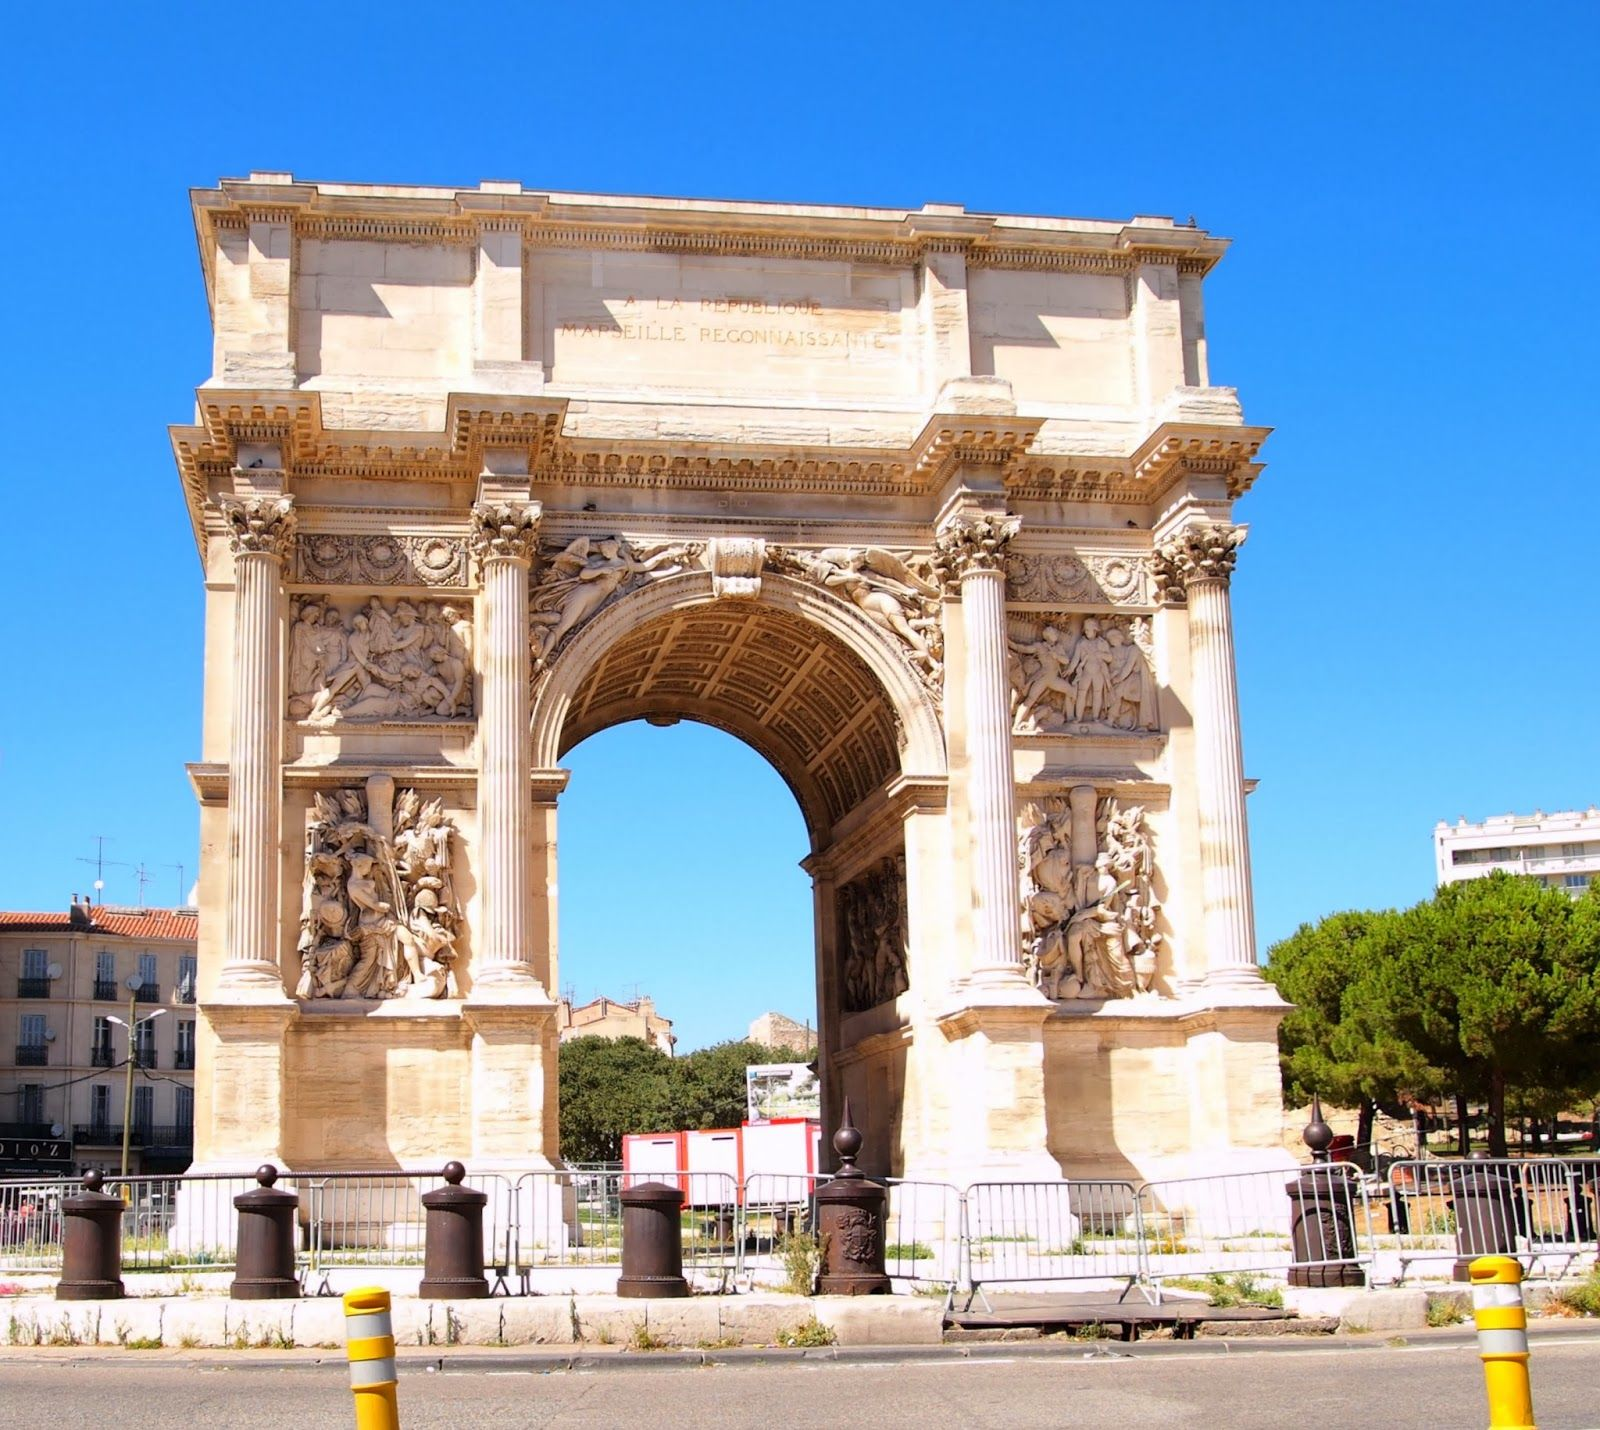 Information Dose Marseilles Arc De Triomphe France Arc De Triomphe American War Of Independence France